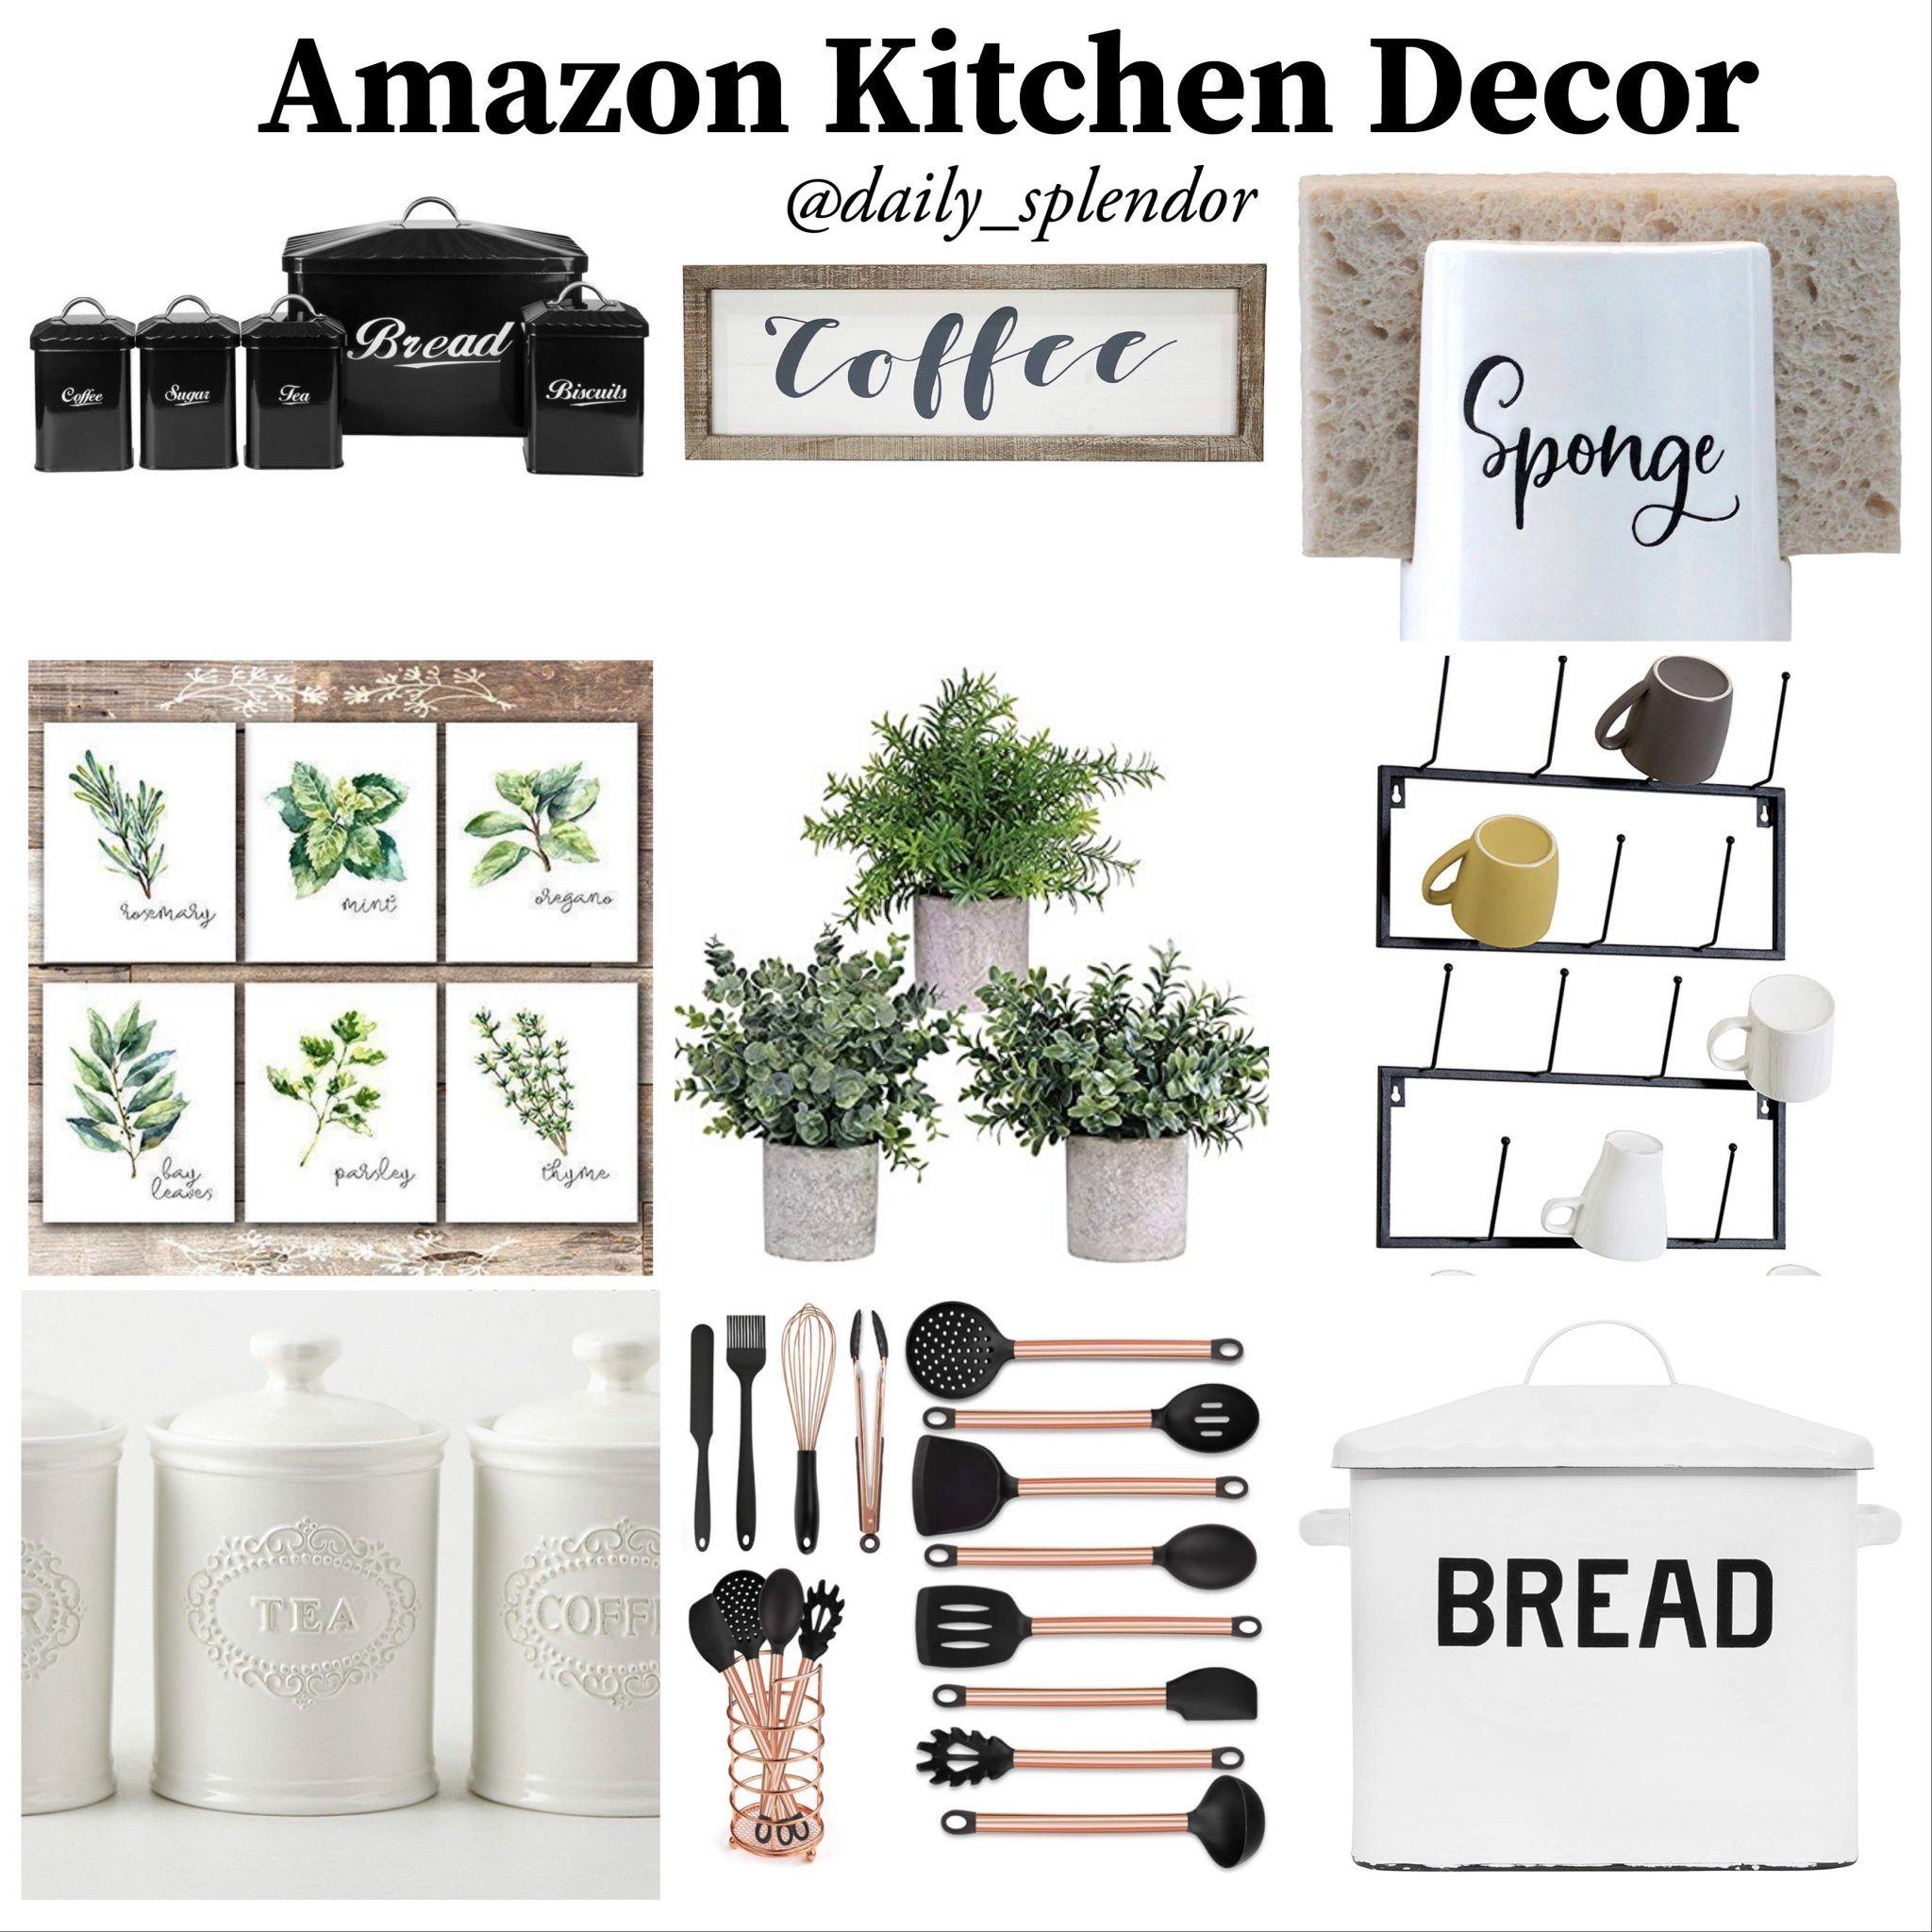 Amazon Kitchen Decor | Daily Splendor Life and Style Blog #kitchendecor #amazonhome #farmhousekitchen #modernfarmhouse #kitchenfinds #amazondecor